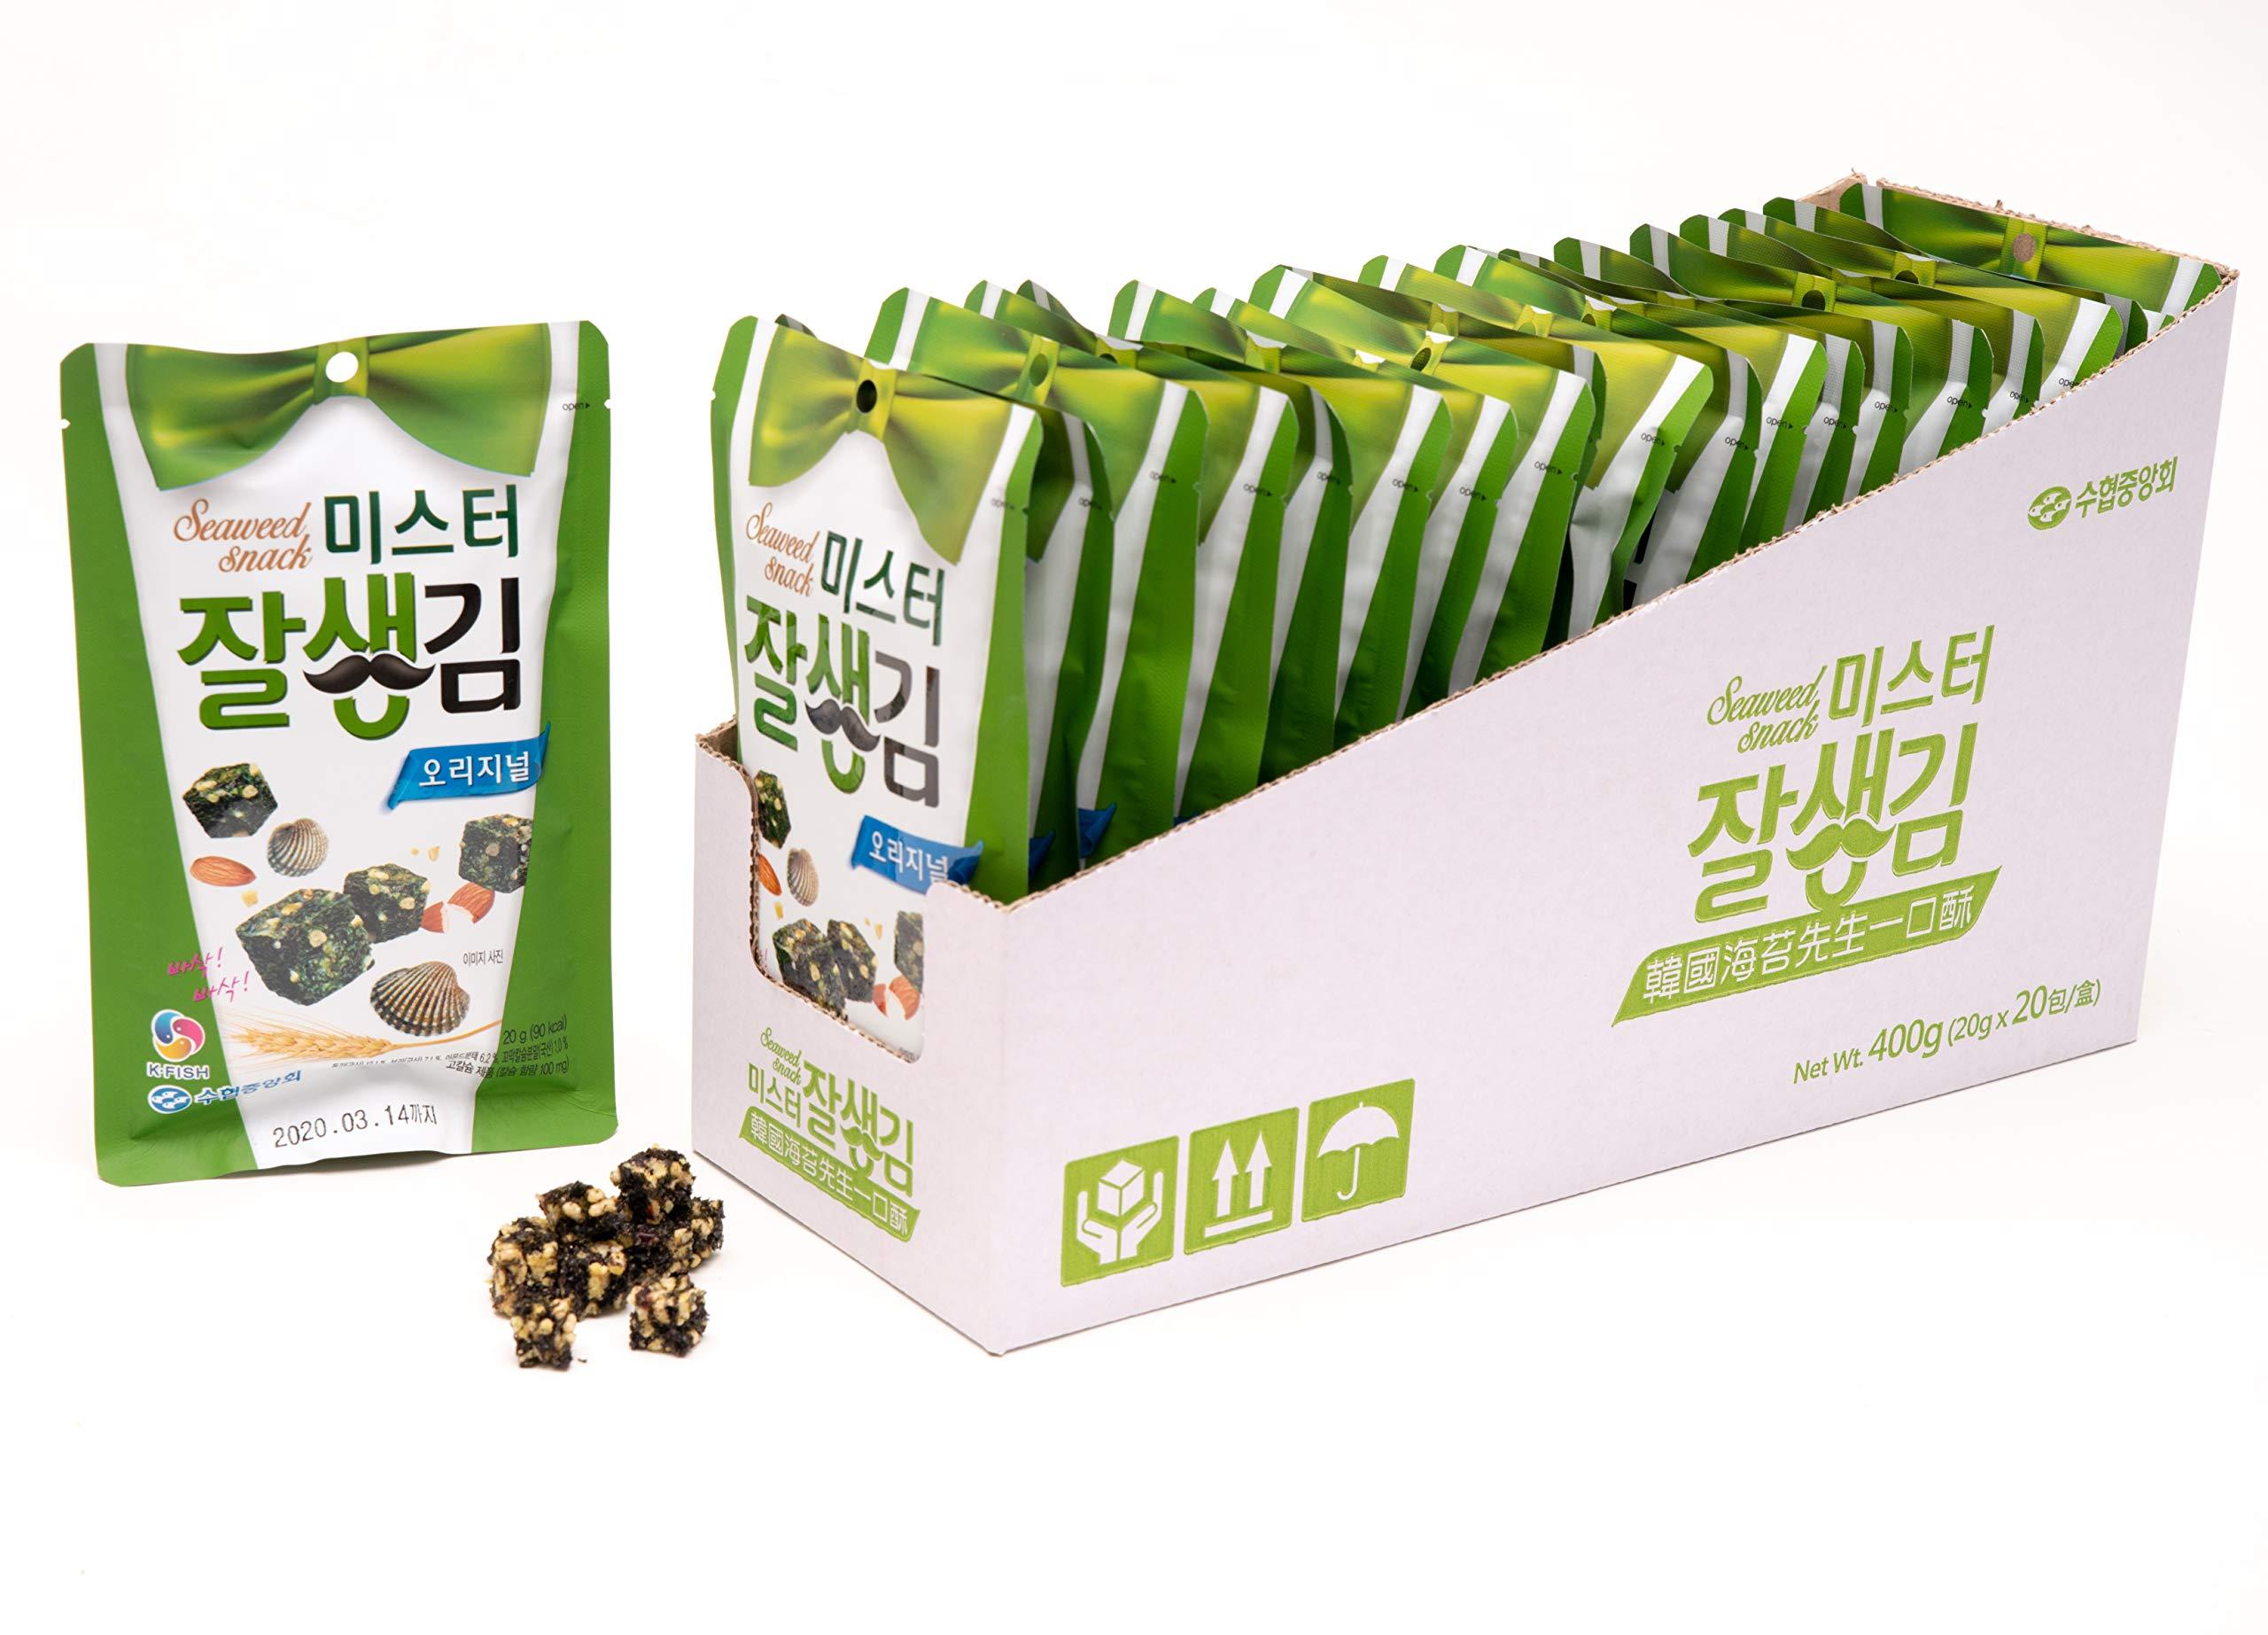 Seaweed Snacks - (20 Packs) Popular Korean Seaweed Cube Snack That's Gourmet Roasted and Lightly Salted - Unique Shape and Irresistible Taste by K Fish (Original Flavor) by K Fish